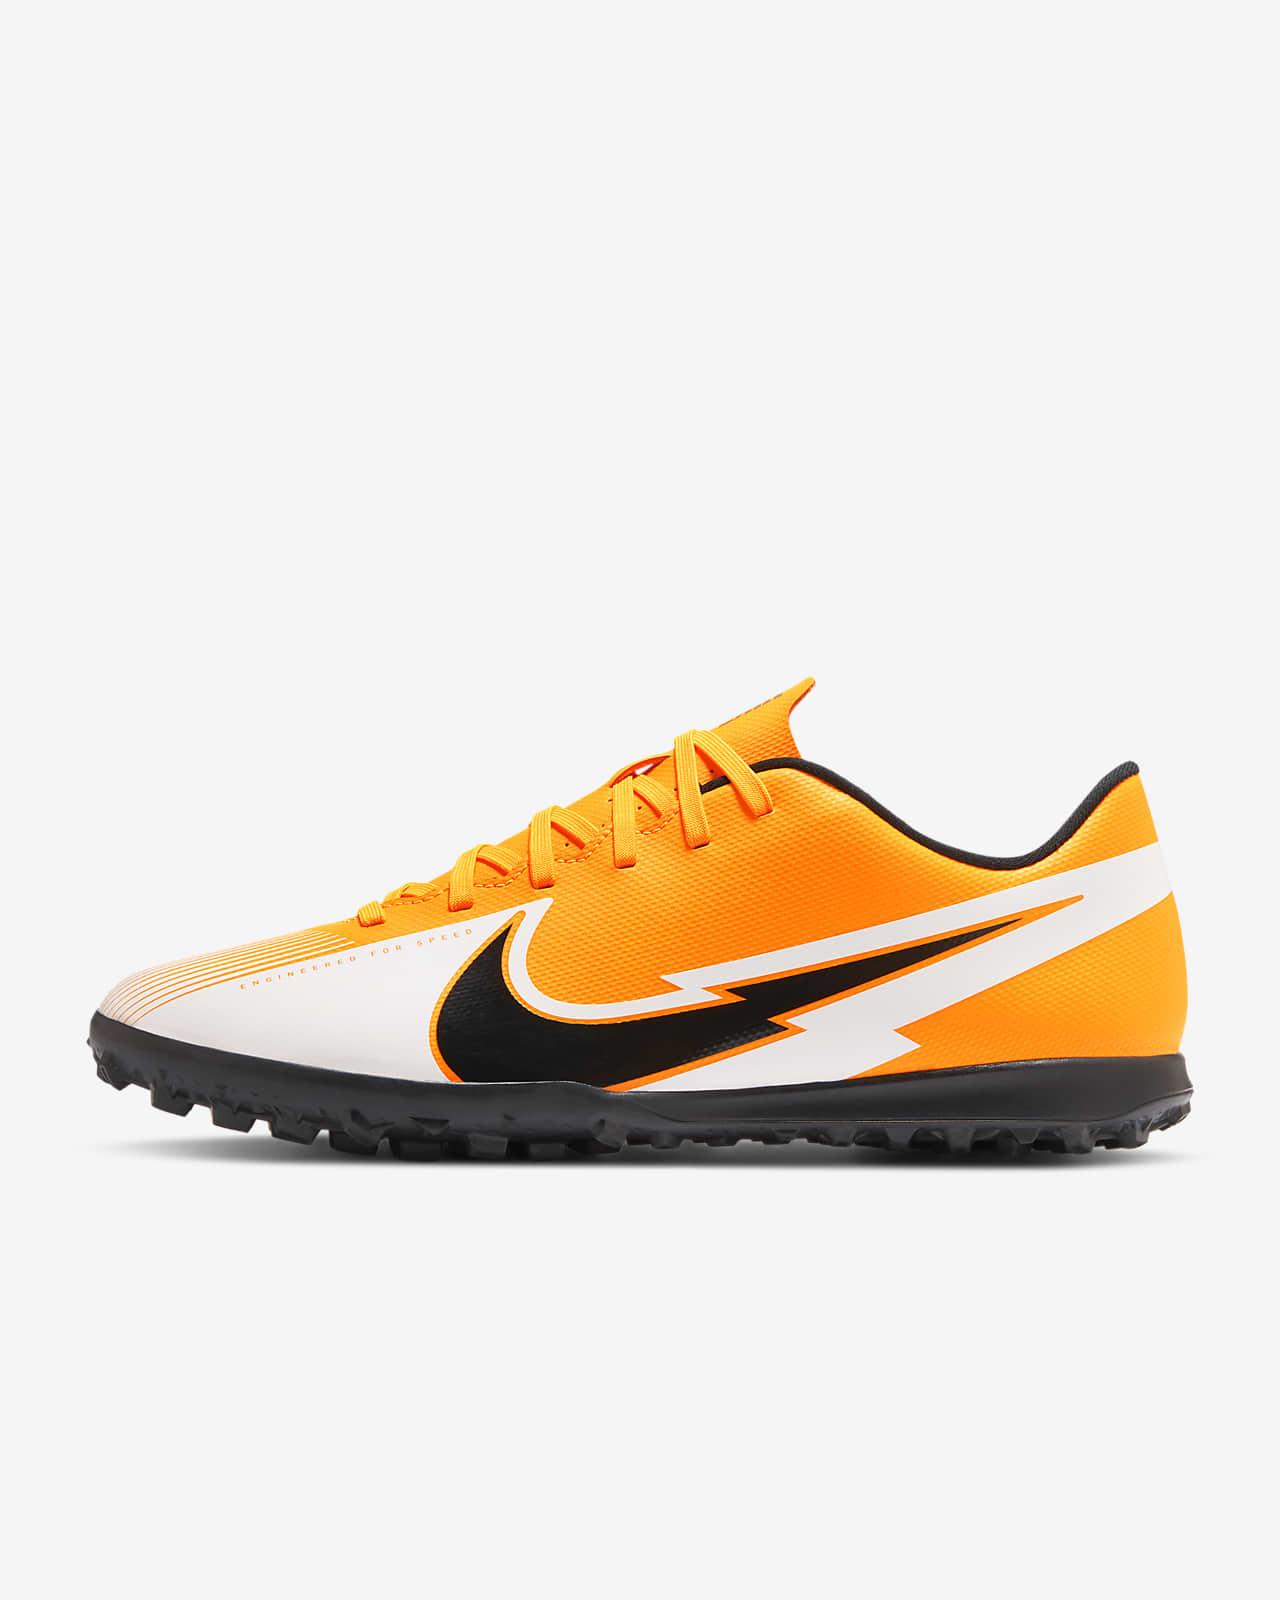 Vivienda Ajustamiento Entender mal  Nike Mercurial Vapor 13 Club TF Artificial-Turf Football Shoe. Nike LU